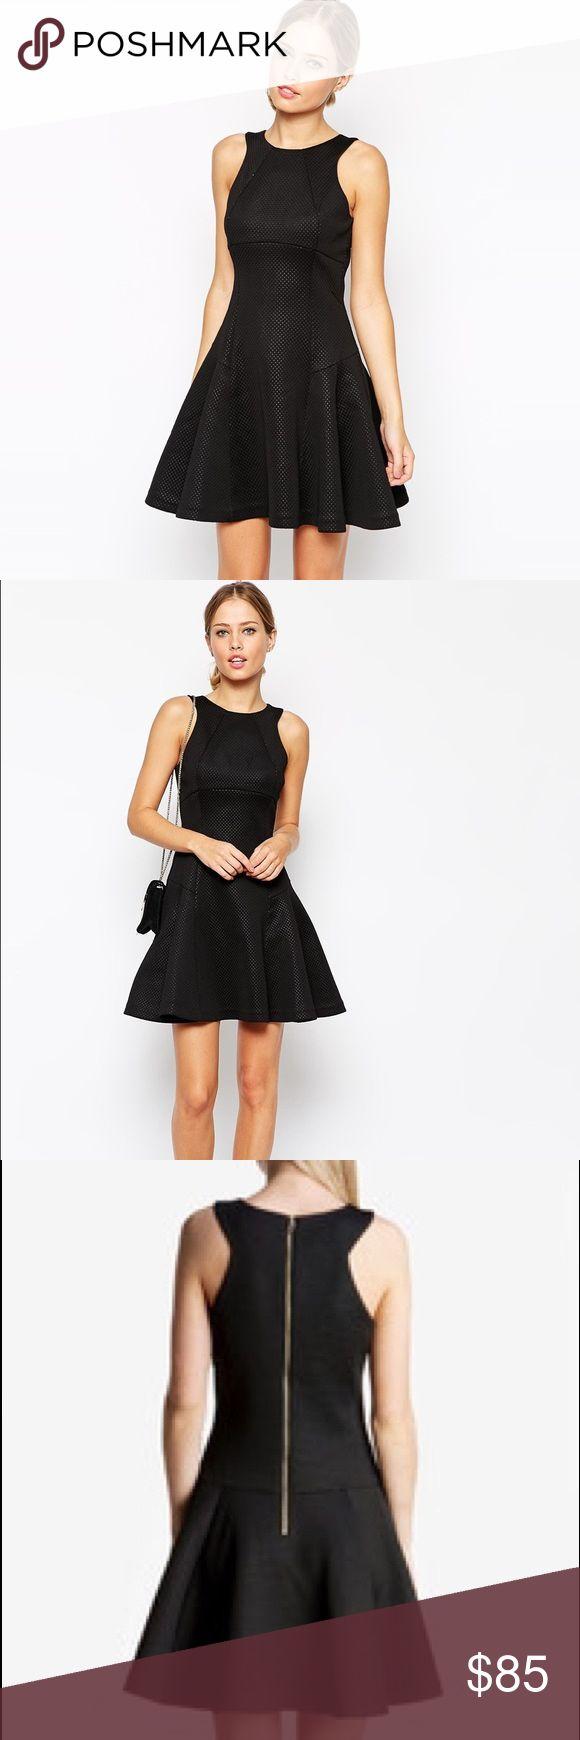 Ted Baker Cidia Black Dress So gorgeous! New condition -never worn. Size 2. Ted Baker London Dresses Mini